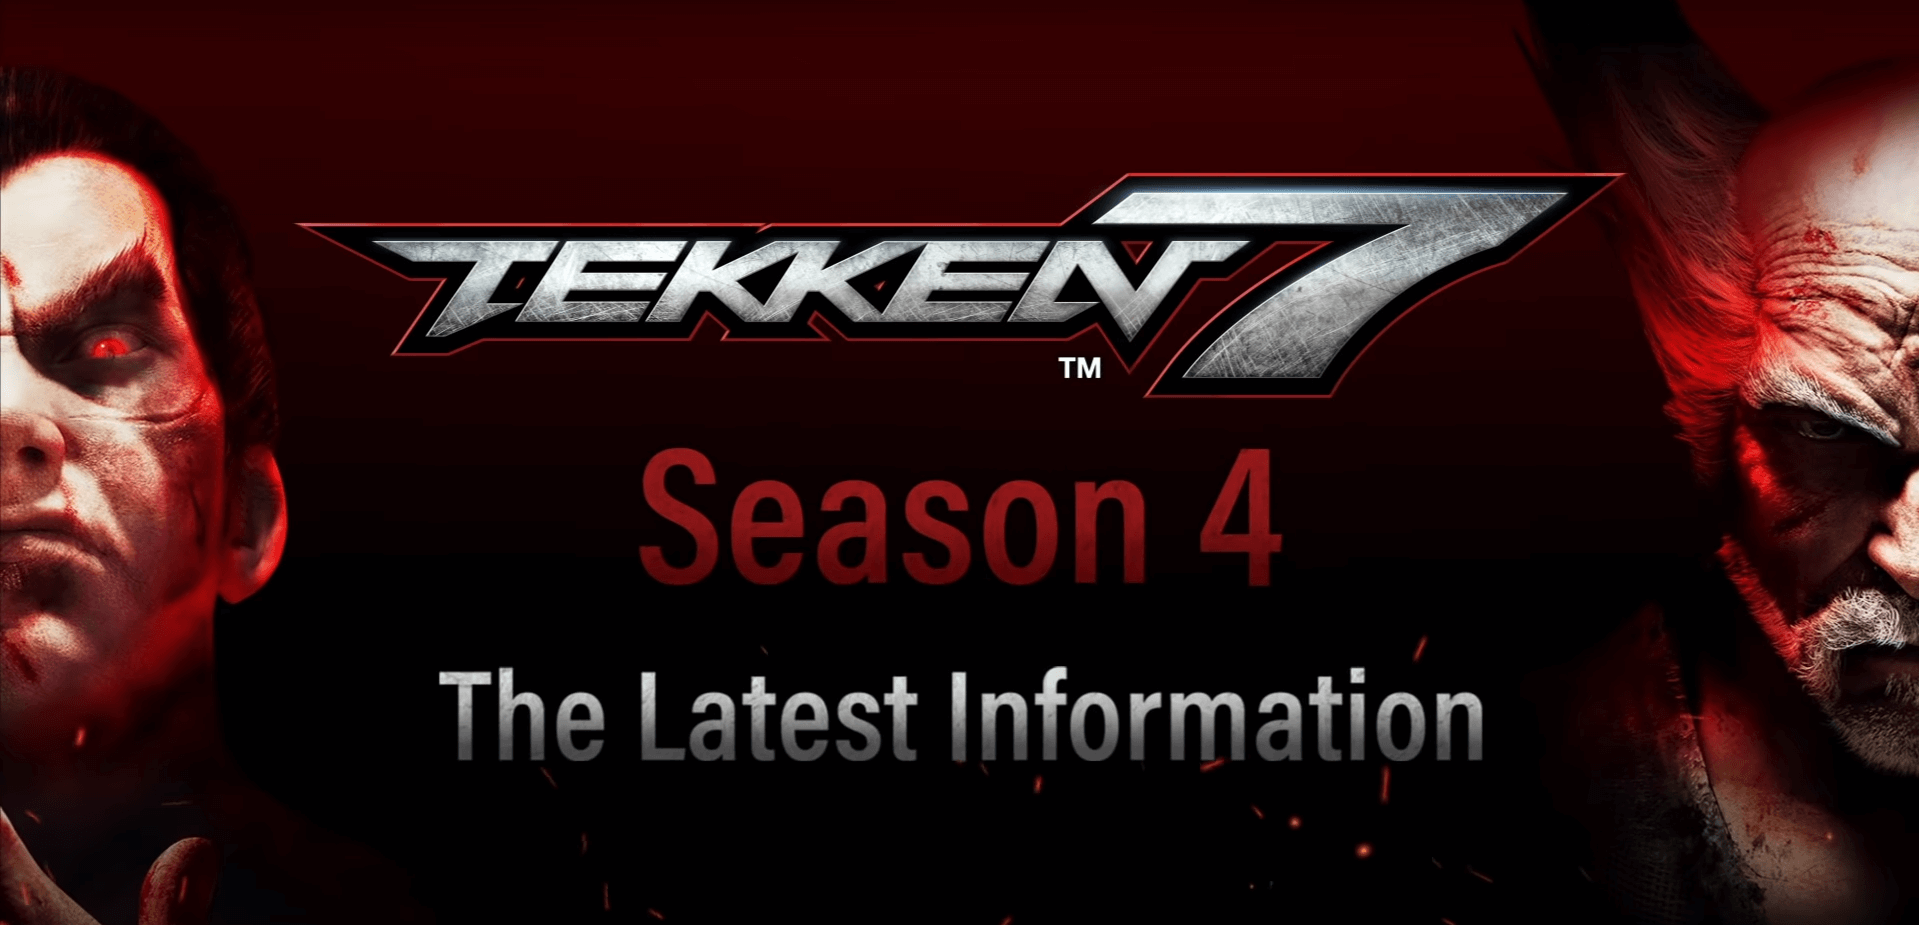 Covid-19 Postpones Tekken 7 Season 4